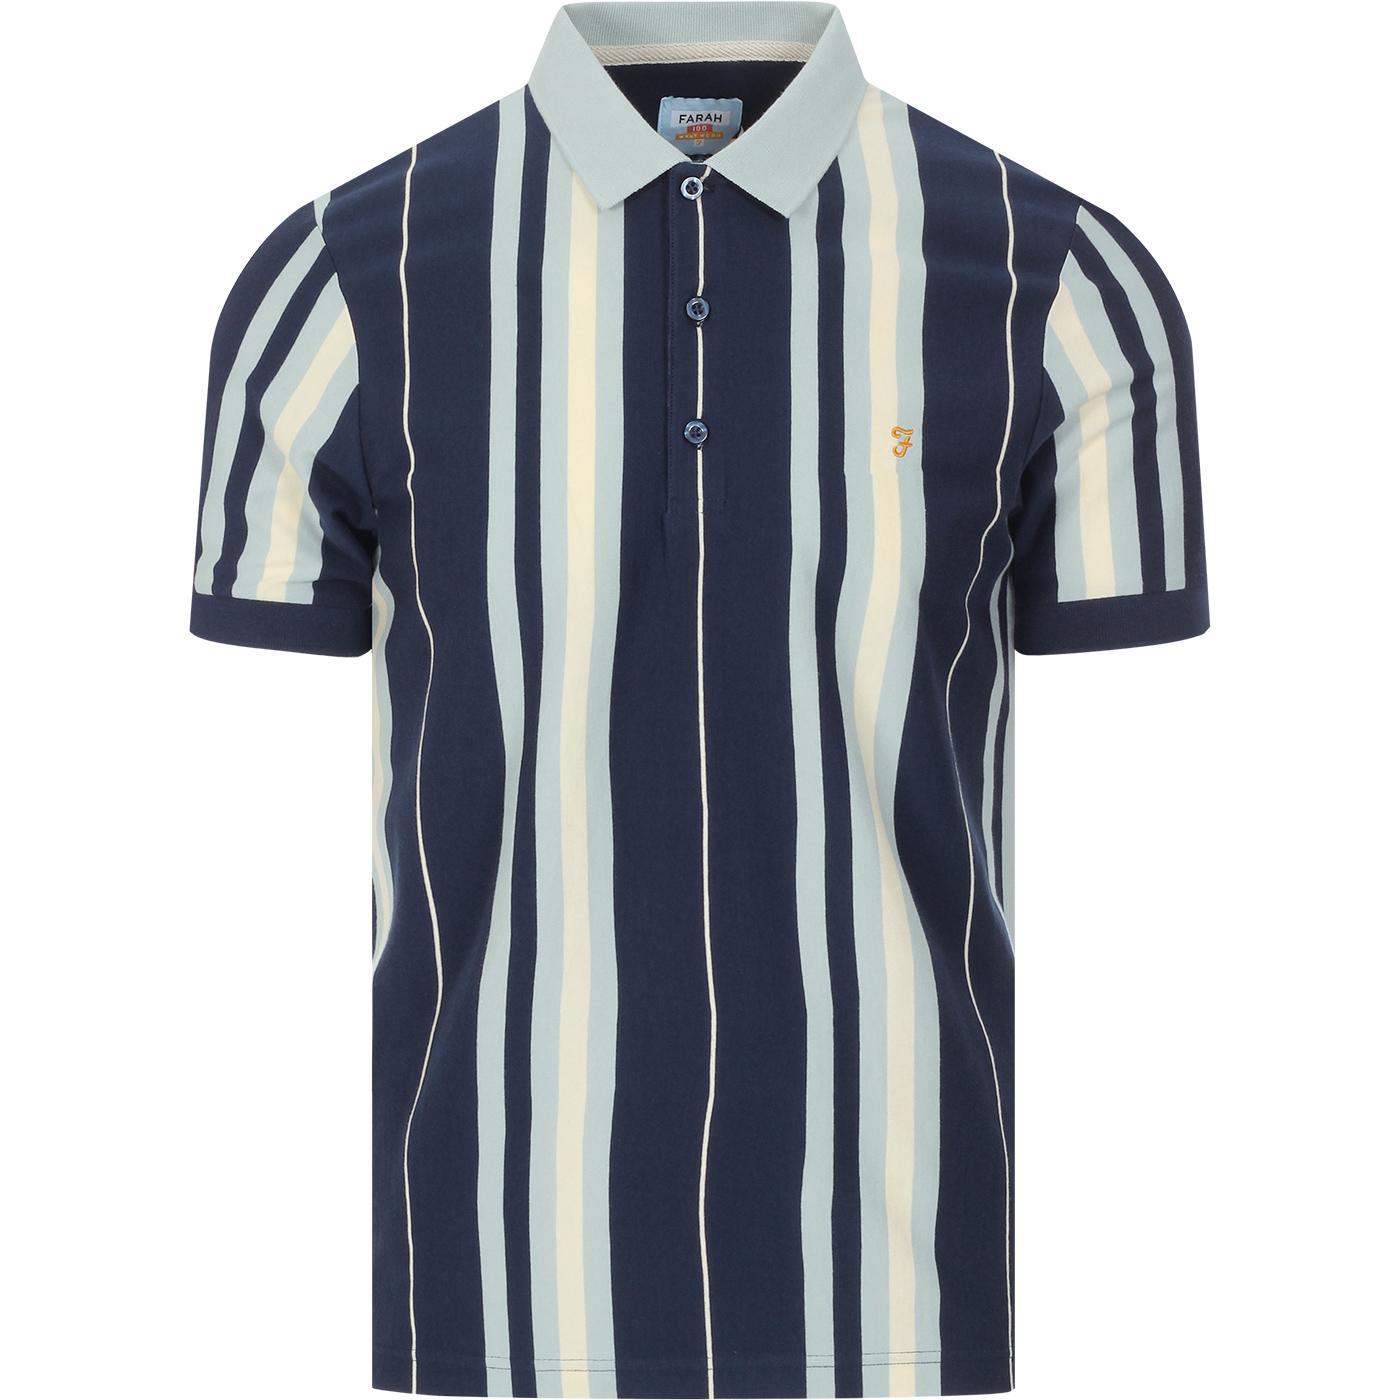 Wigwam FARAH 100 60s Mod Stripe Polo Top (Yale)